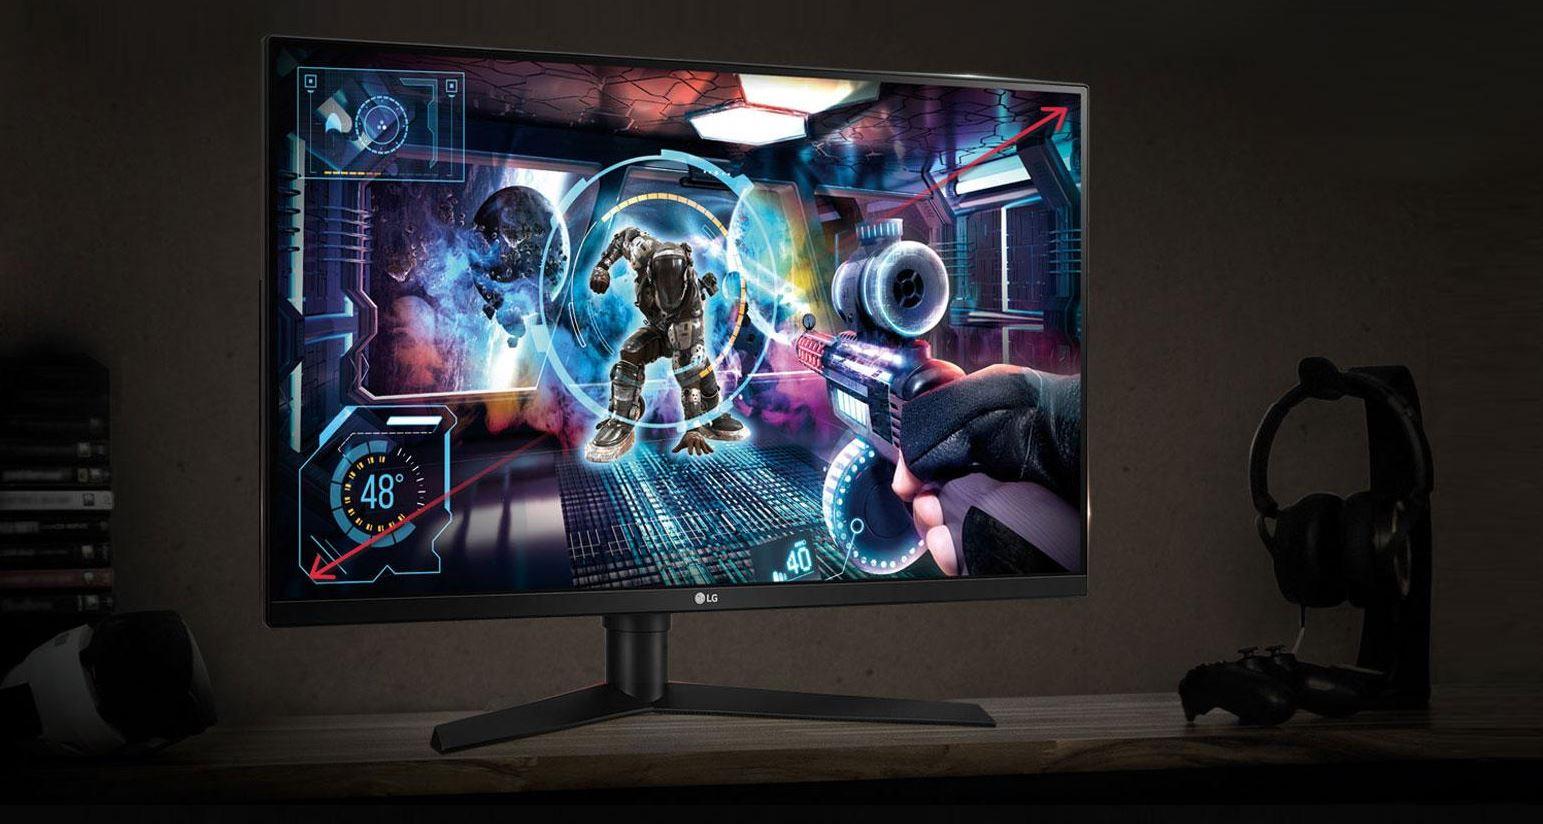 LG 31 Inch G Sync LCD Gaming Monitor on Desk